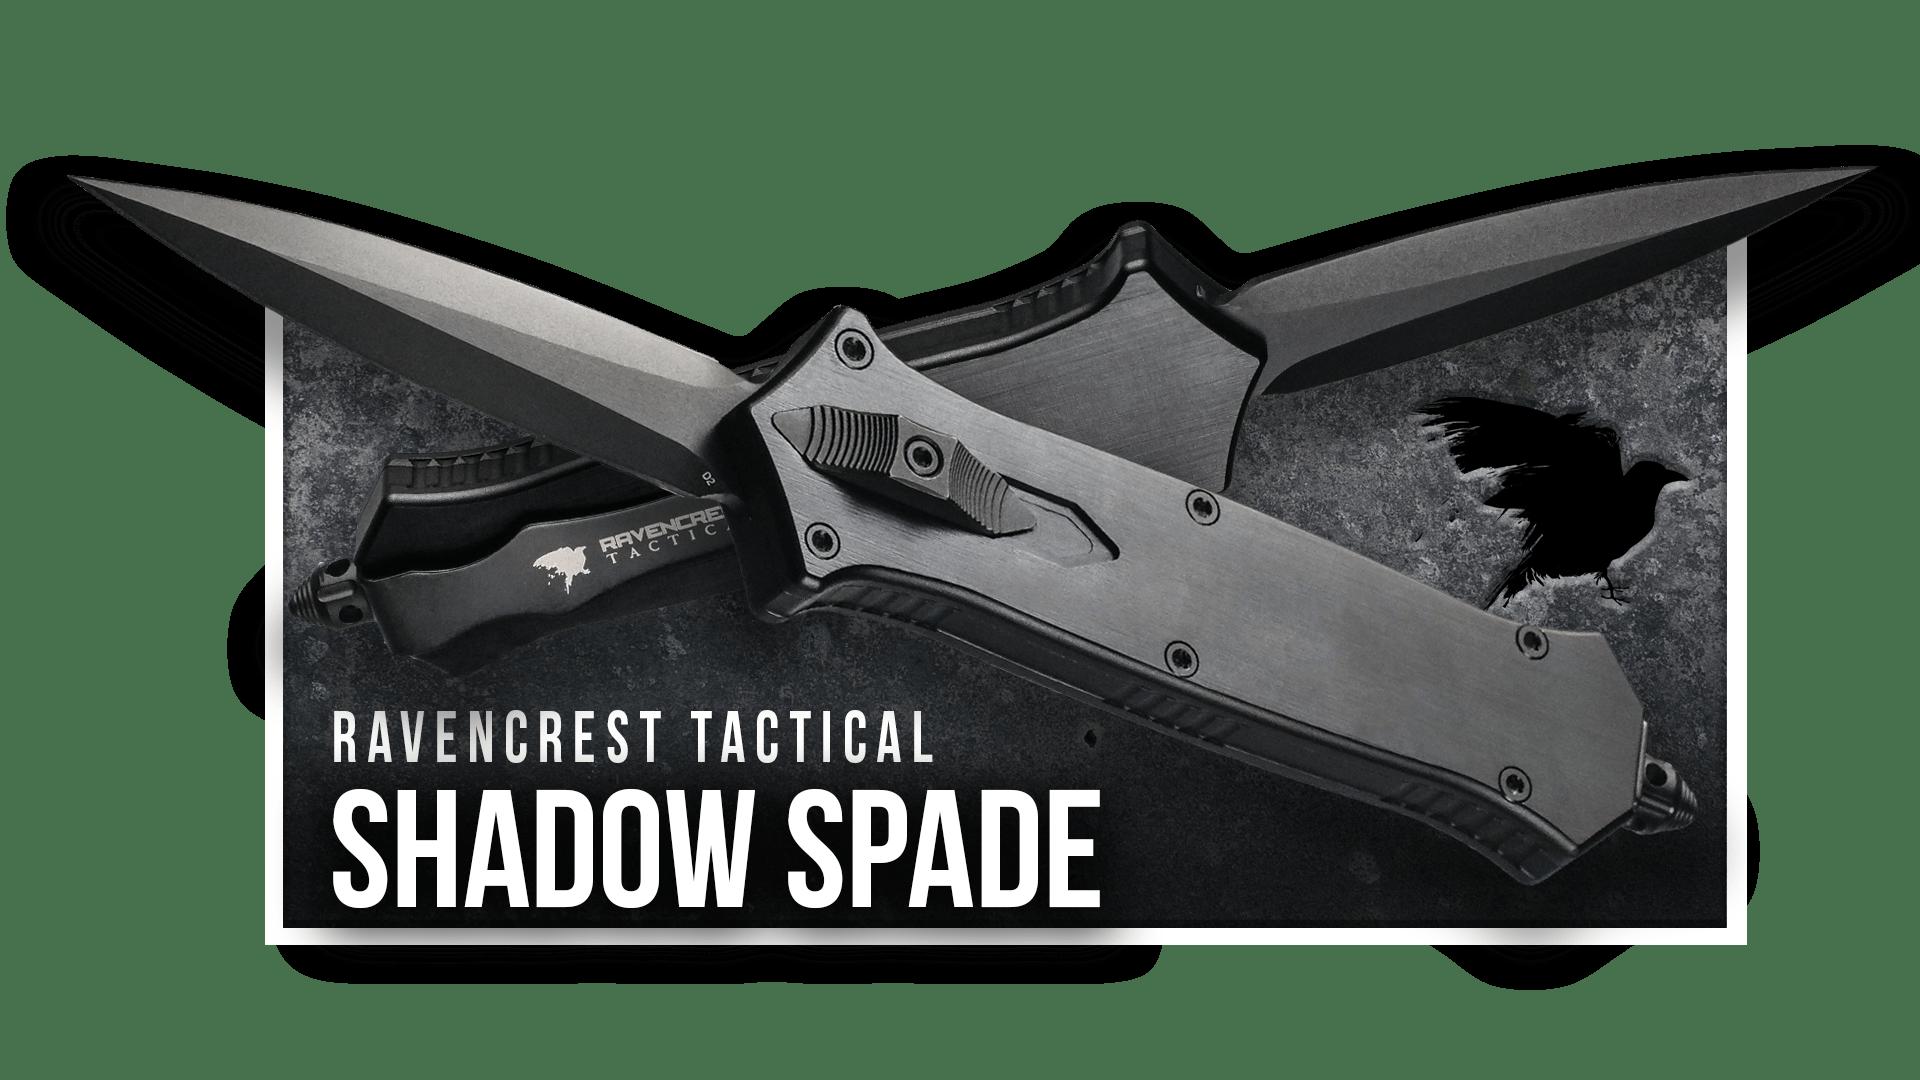 OTF Knife - Shadow Spade - RavenCrest Tactical